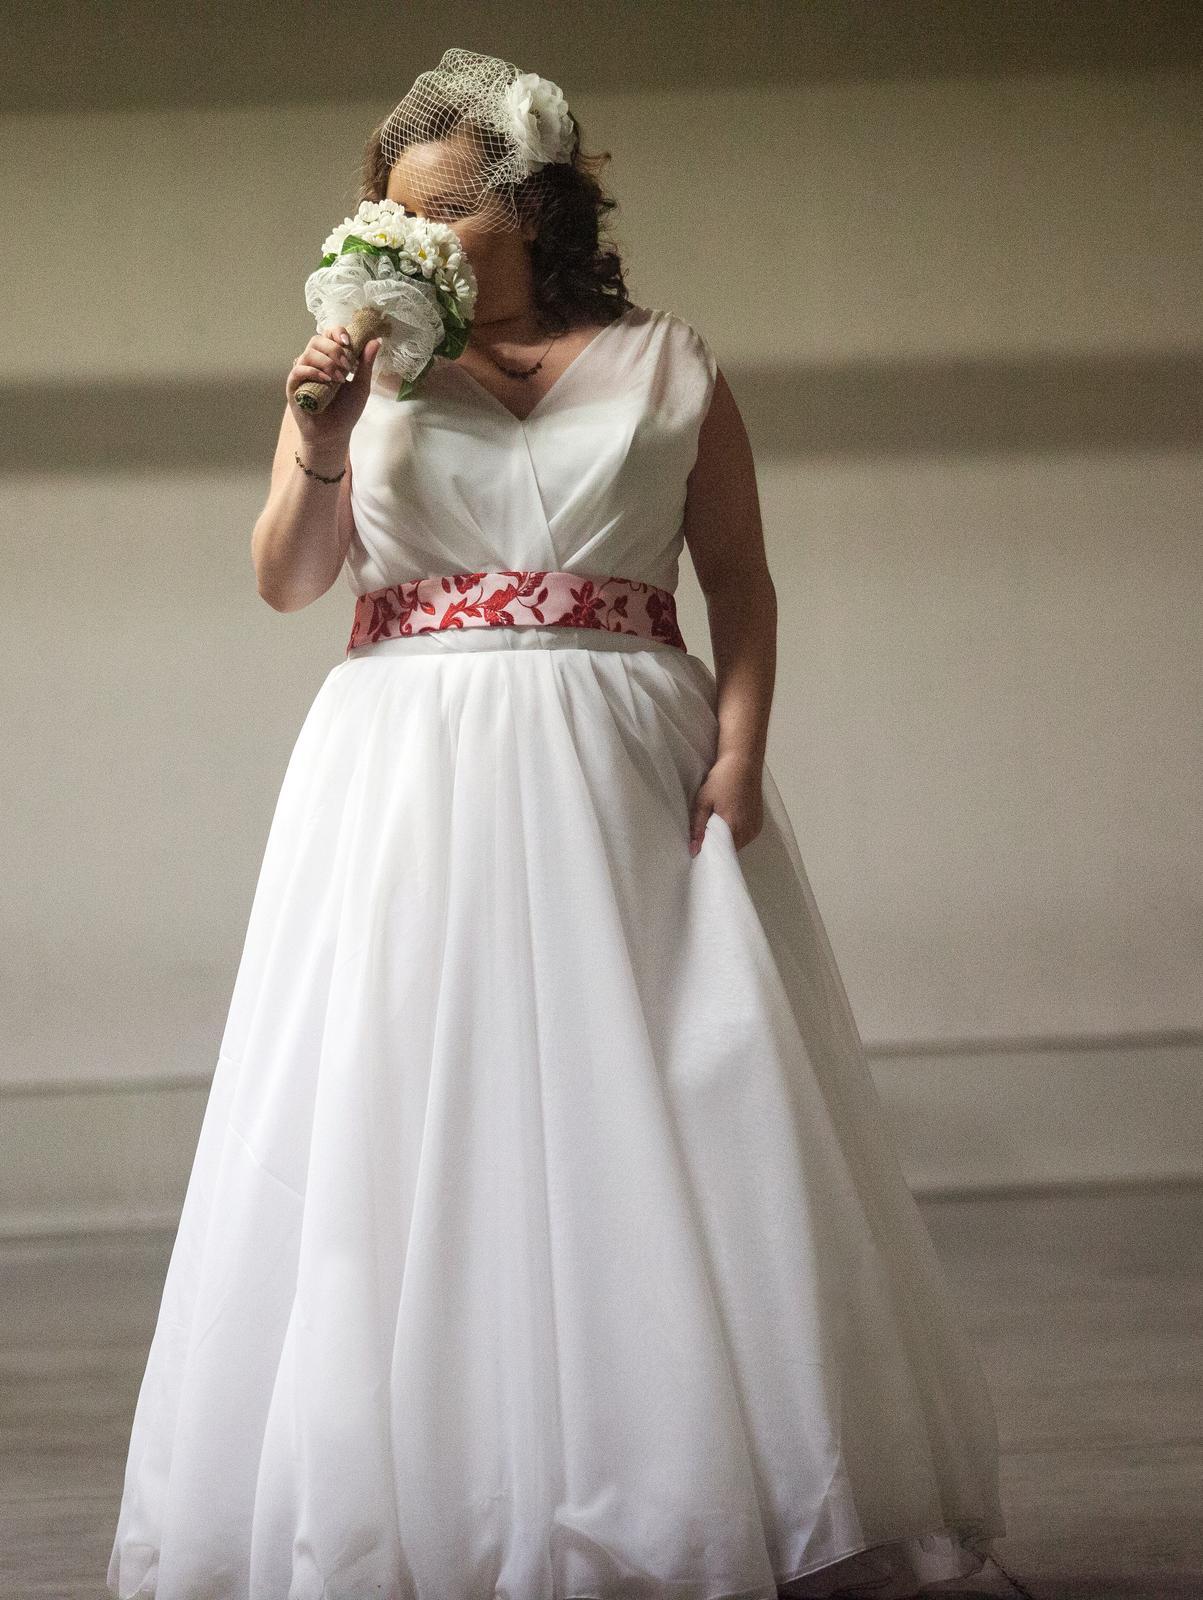 Svadobné šaty pre plus size nevestičku - Obrázok č. 1